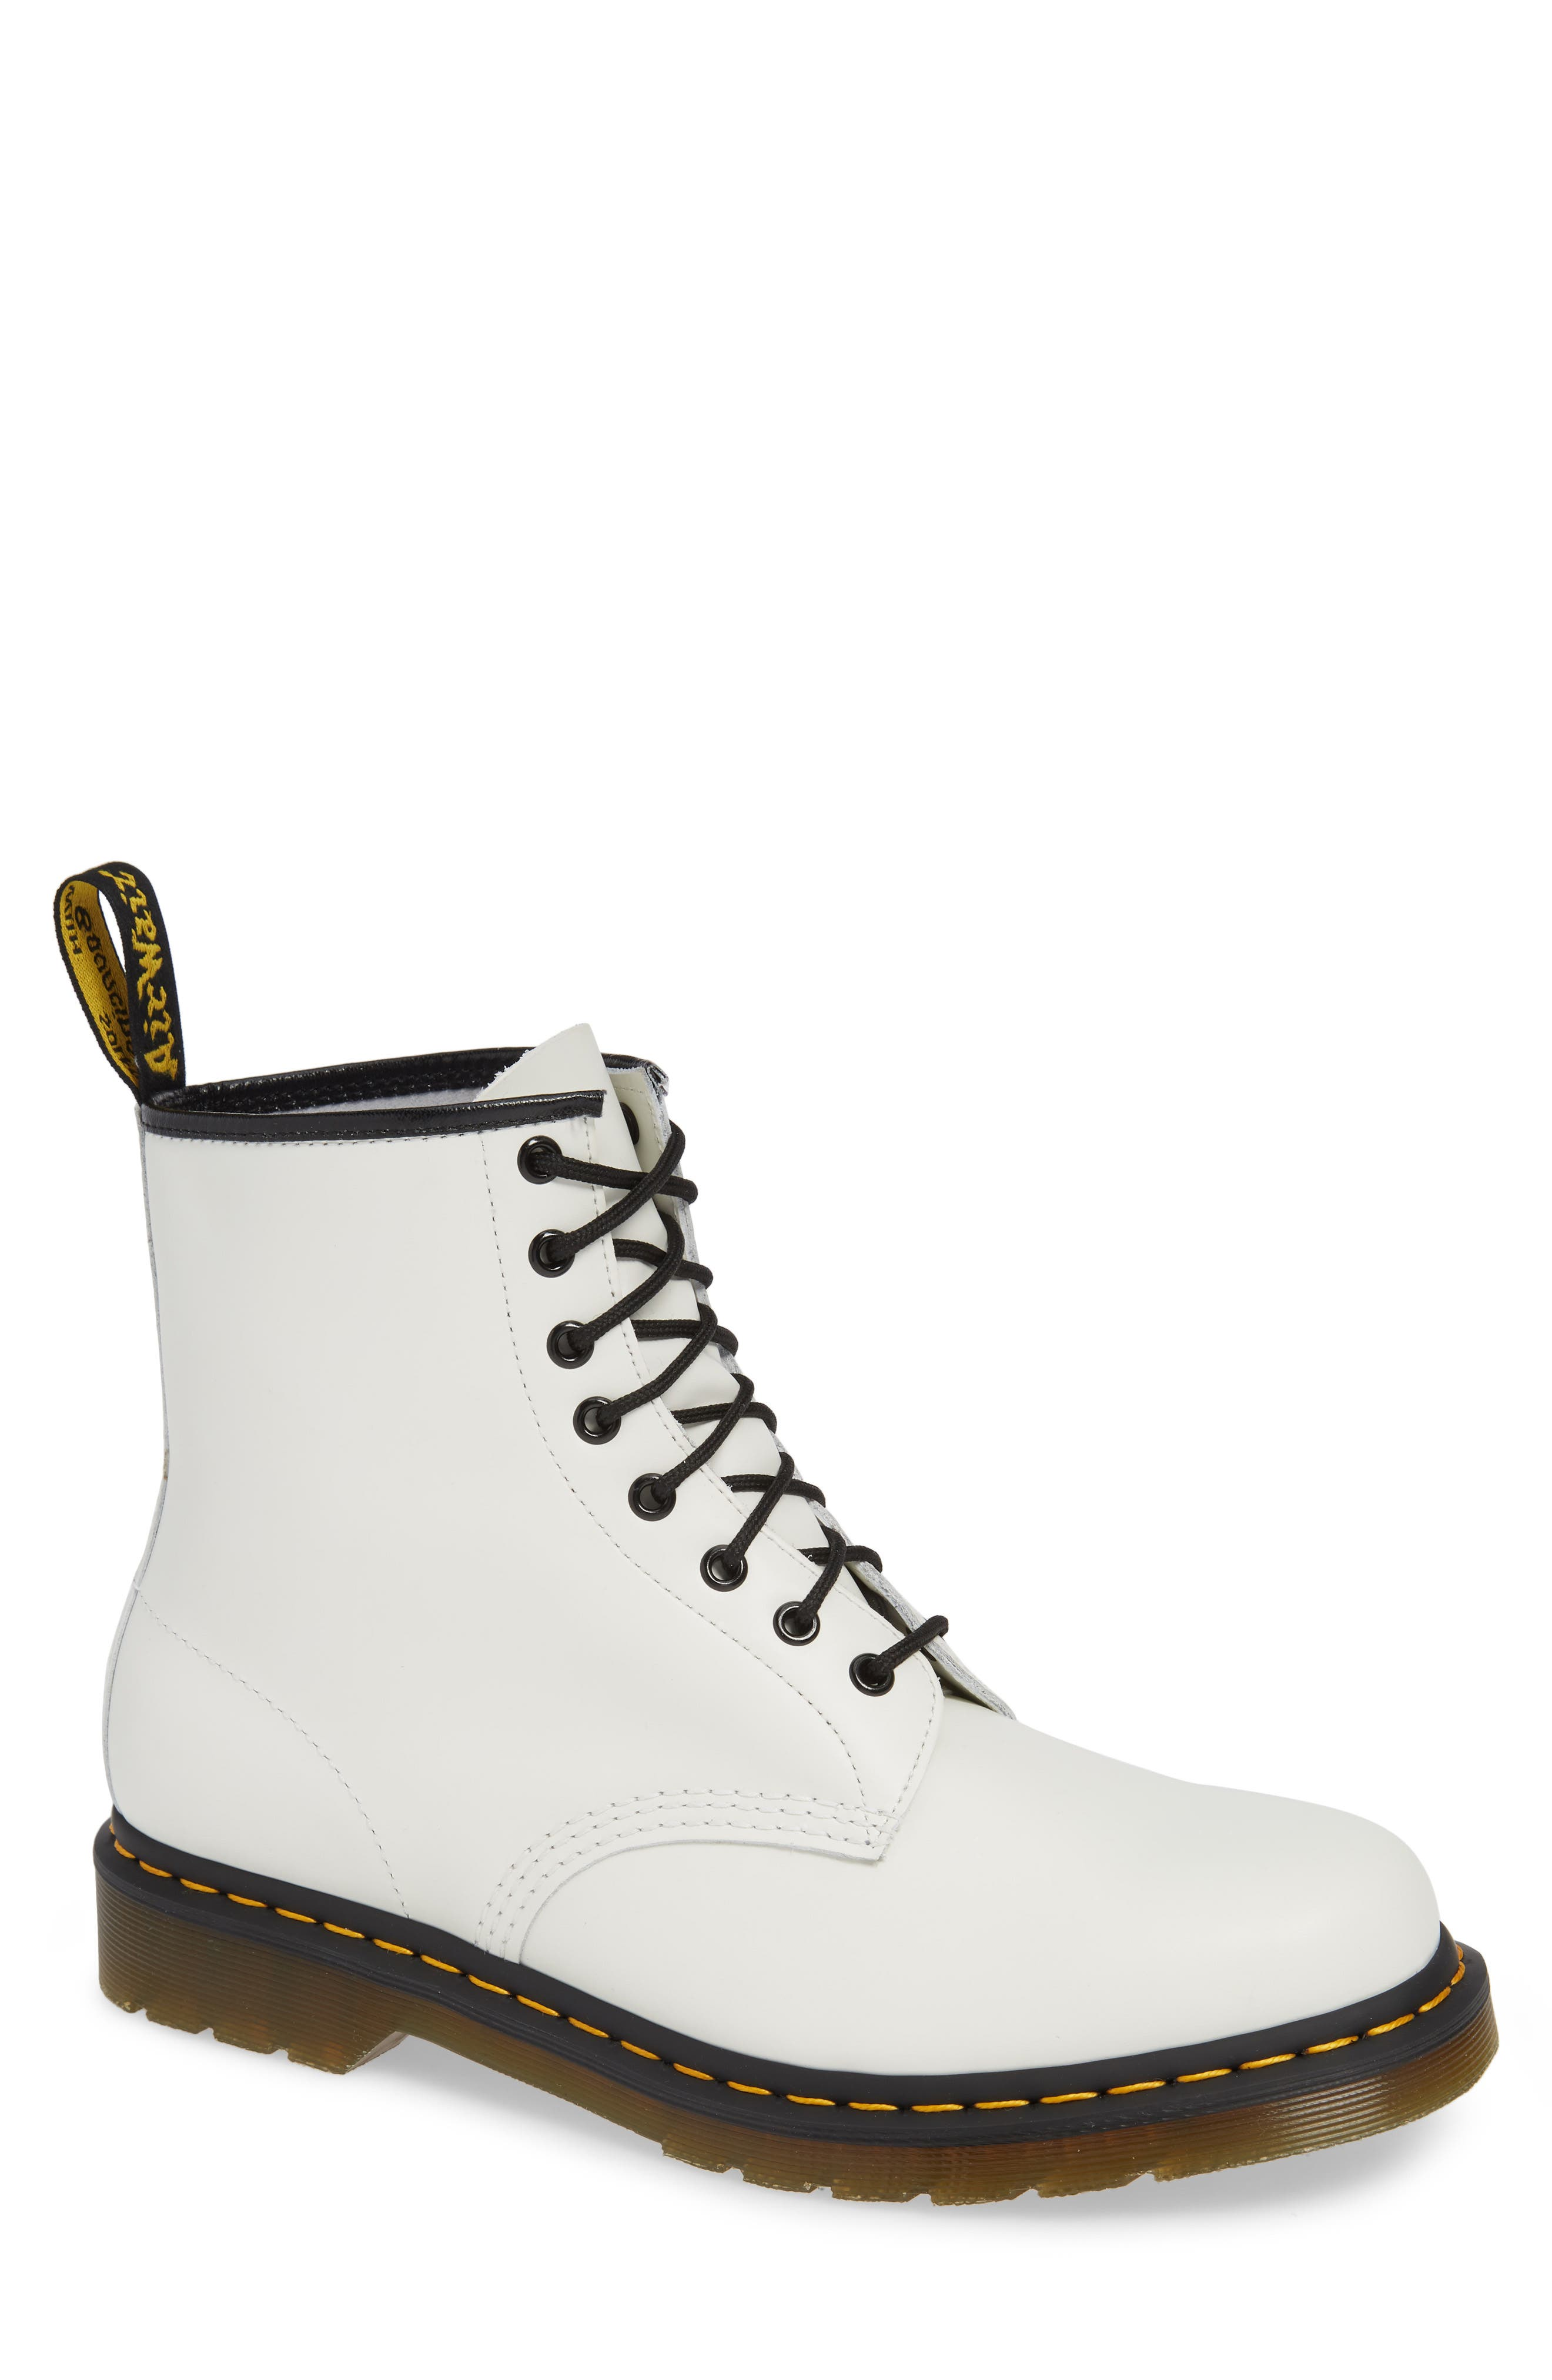 321fe0a4daf3 Dr. Martens '1460' Boot, White